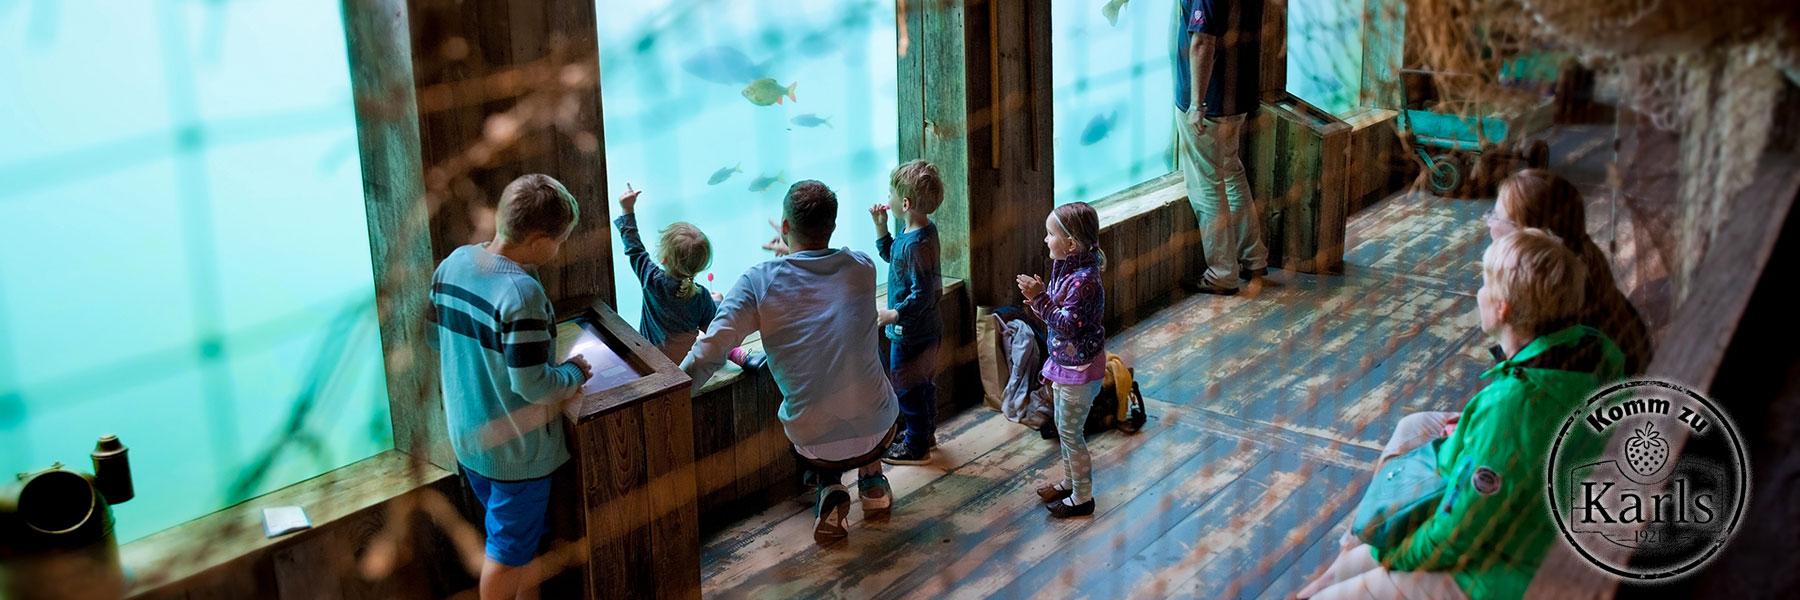 Aquarium - Karls Erlebnis-Dorf